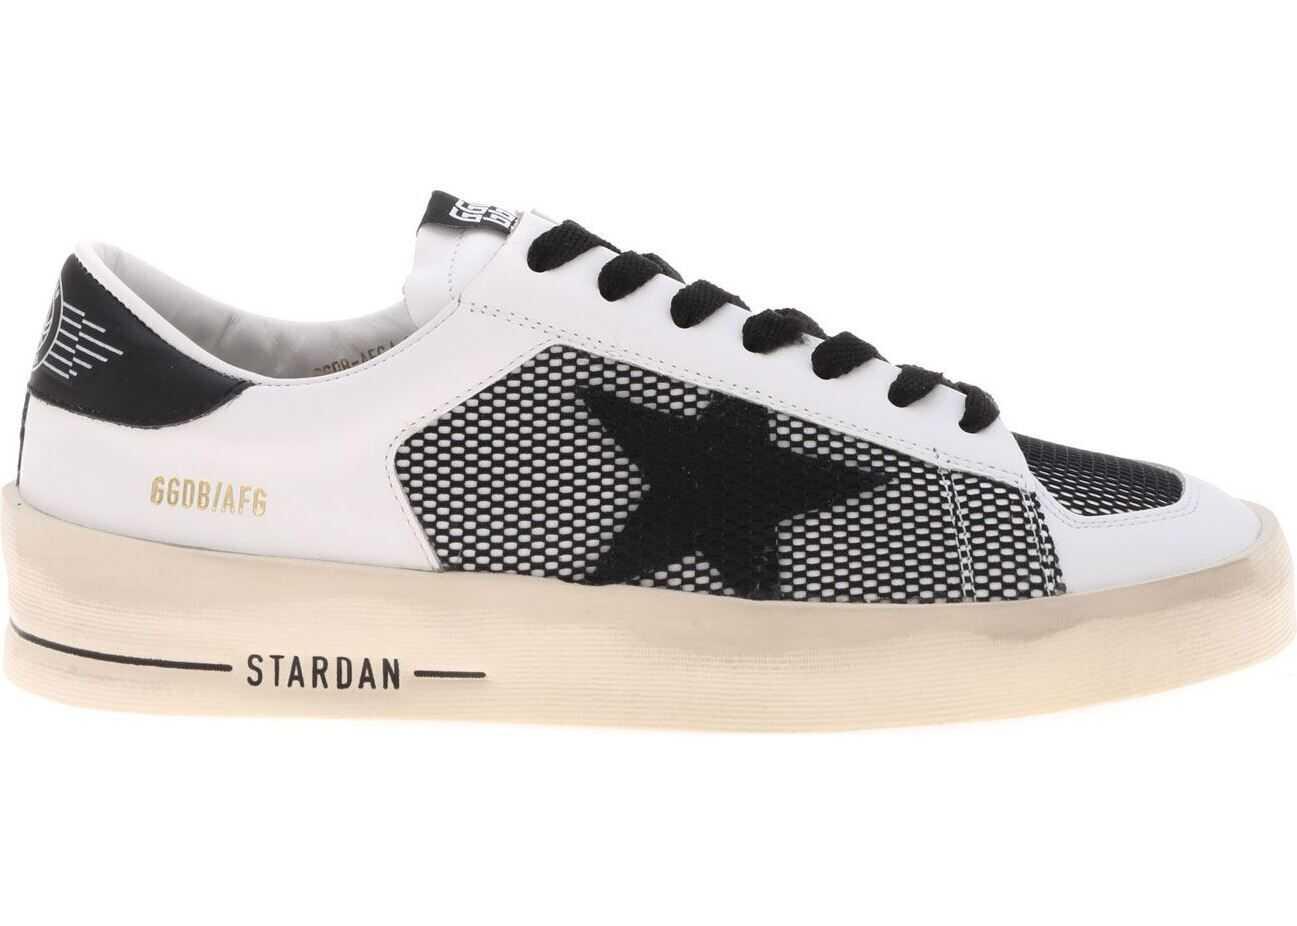 Golden Goose Stardan Sneakers In Black And White White